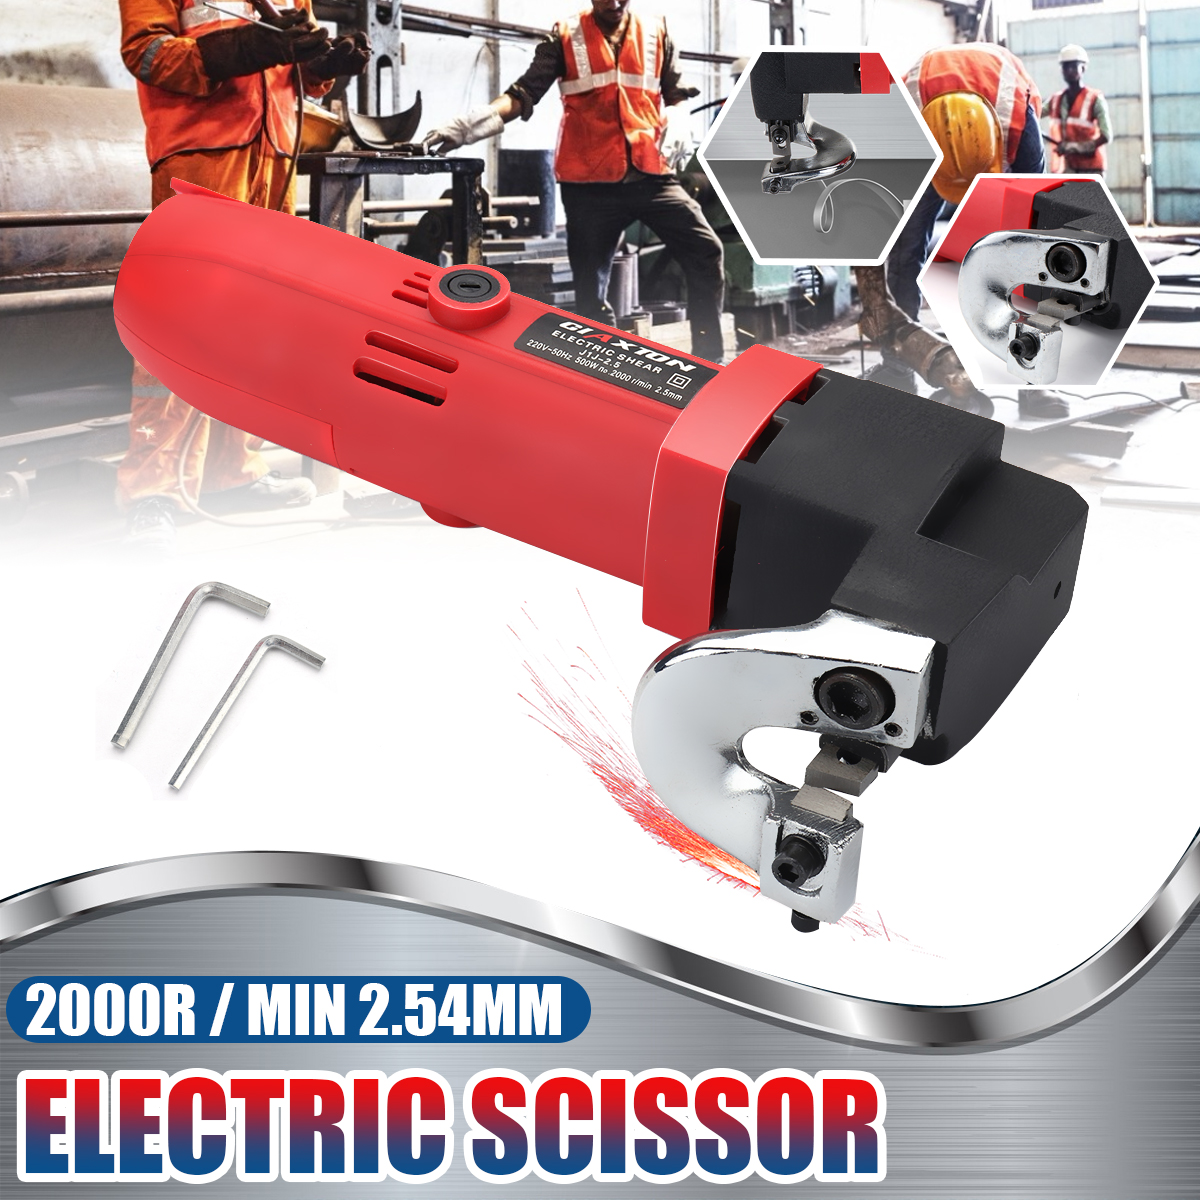 500W 220V 2000r/min EU Plug Professional Electric Sheet Metal Shear Snip Scissor Cutter  Tool Aluminum Alloy 290x77x145mm